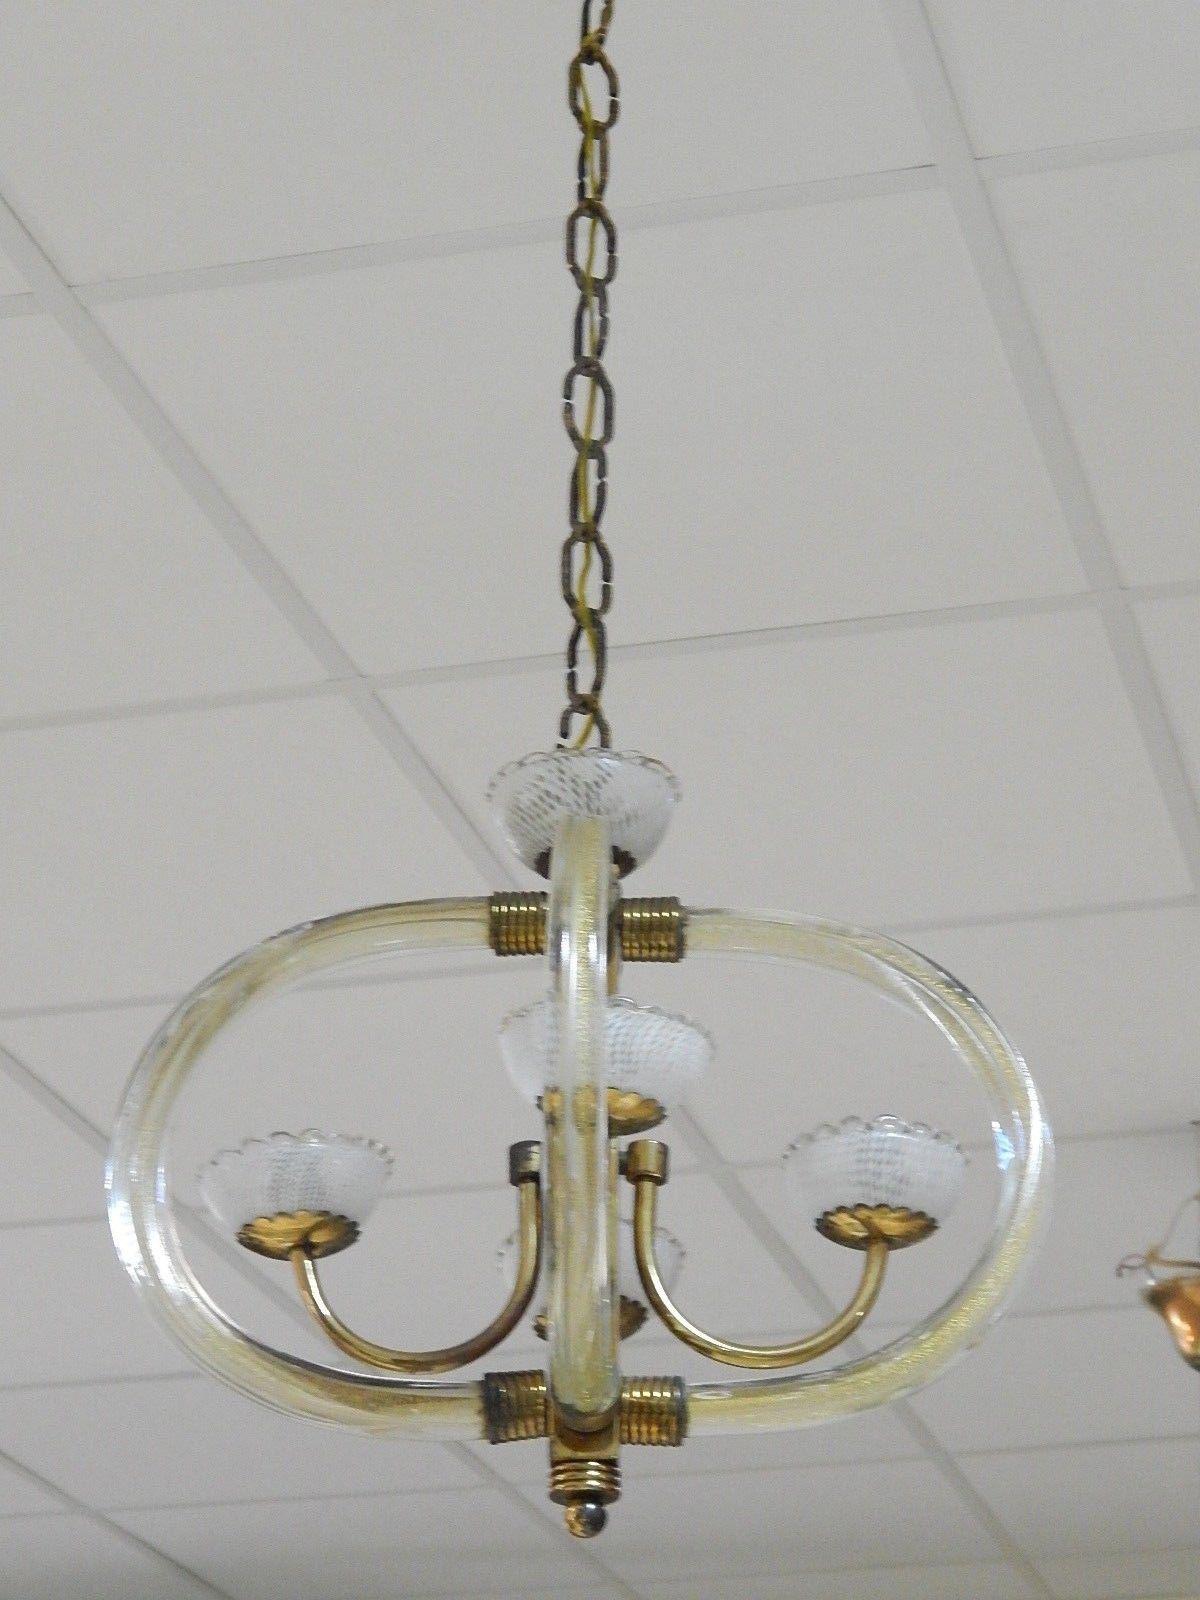 Importante lampadario in vetro di murano, venini, anni '30 / lampadario. Lampadario Murano Venini Anni 30 40 Hanging Lamp Venini Chandelier Lampadari Lampade Lampadario